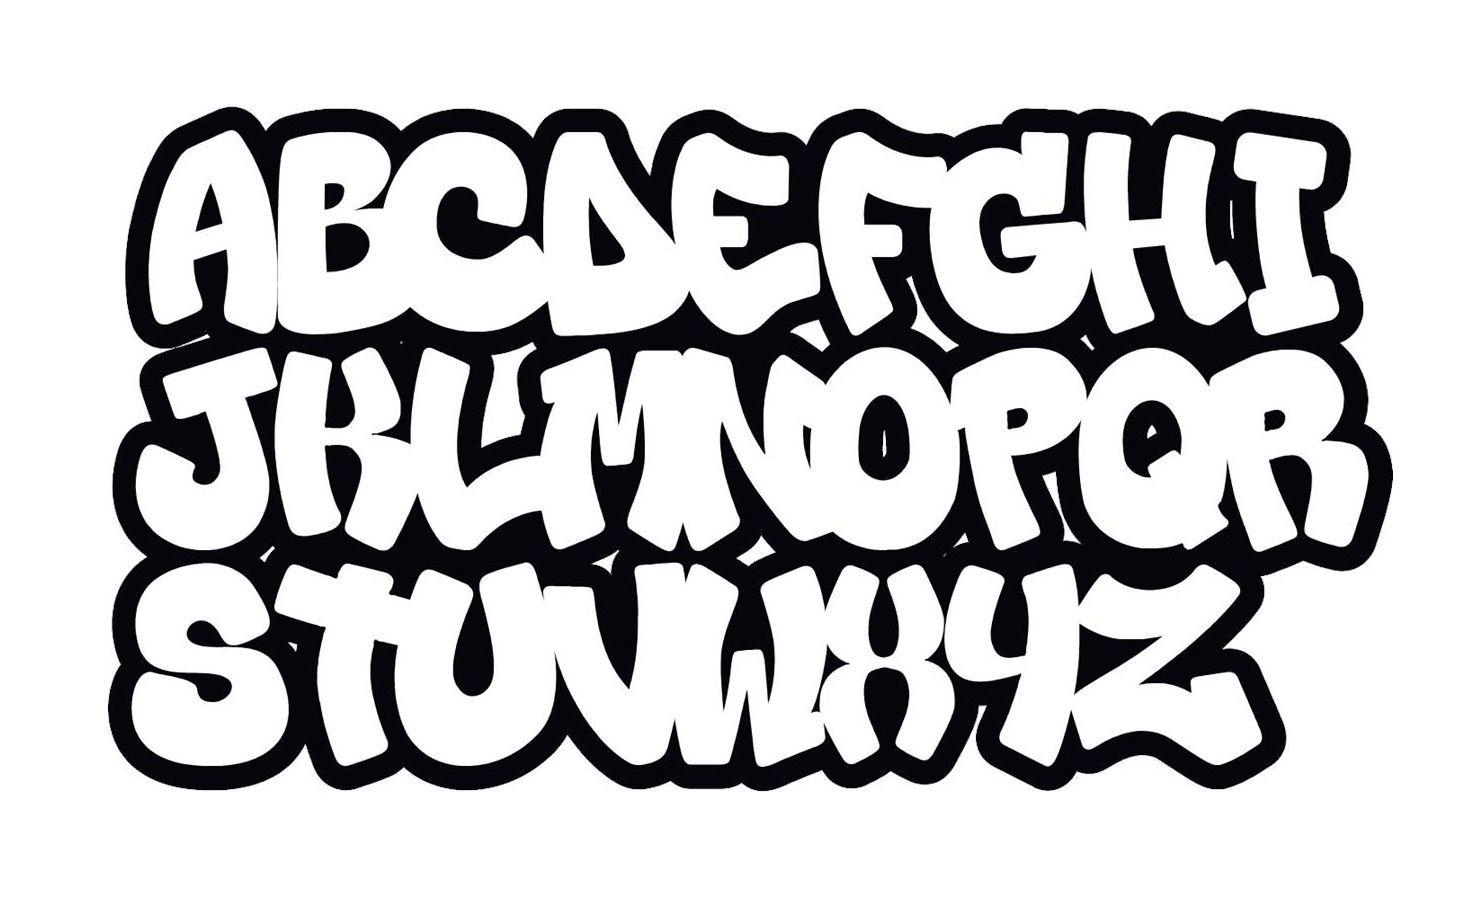 Das Beste Graffiti-Buchstaben Abc (With Images) | Lettering ganzes Graffiti Schriftarten Abc